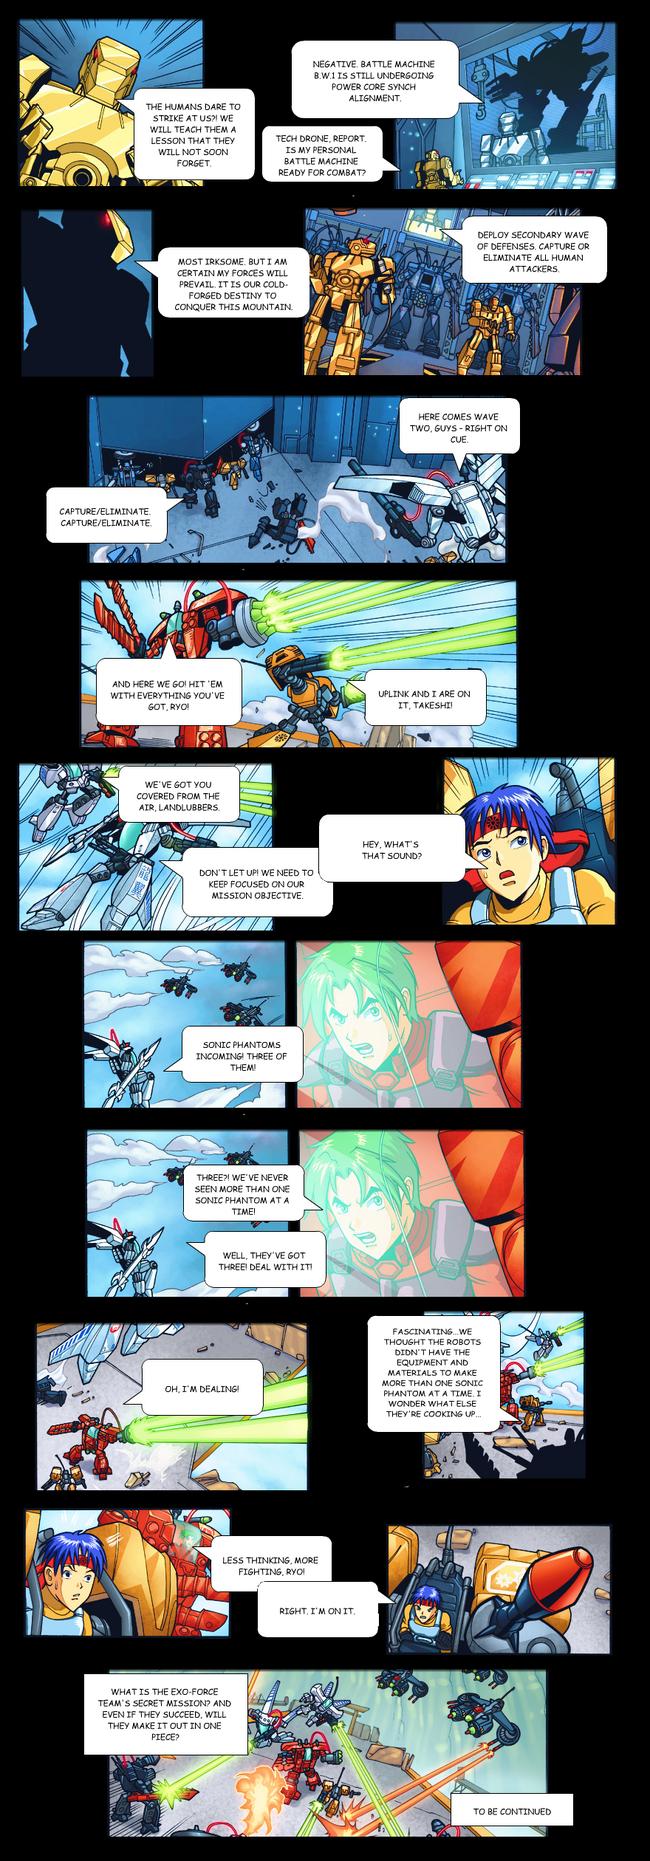 Comic 12 part whatever